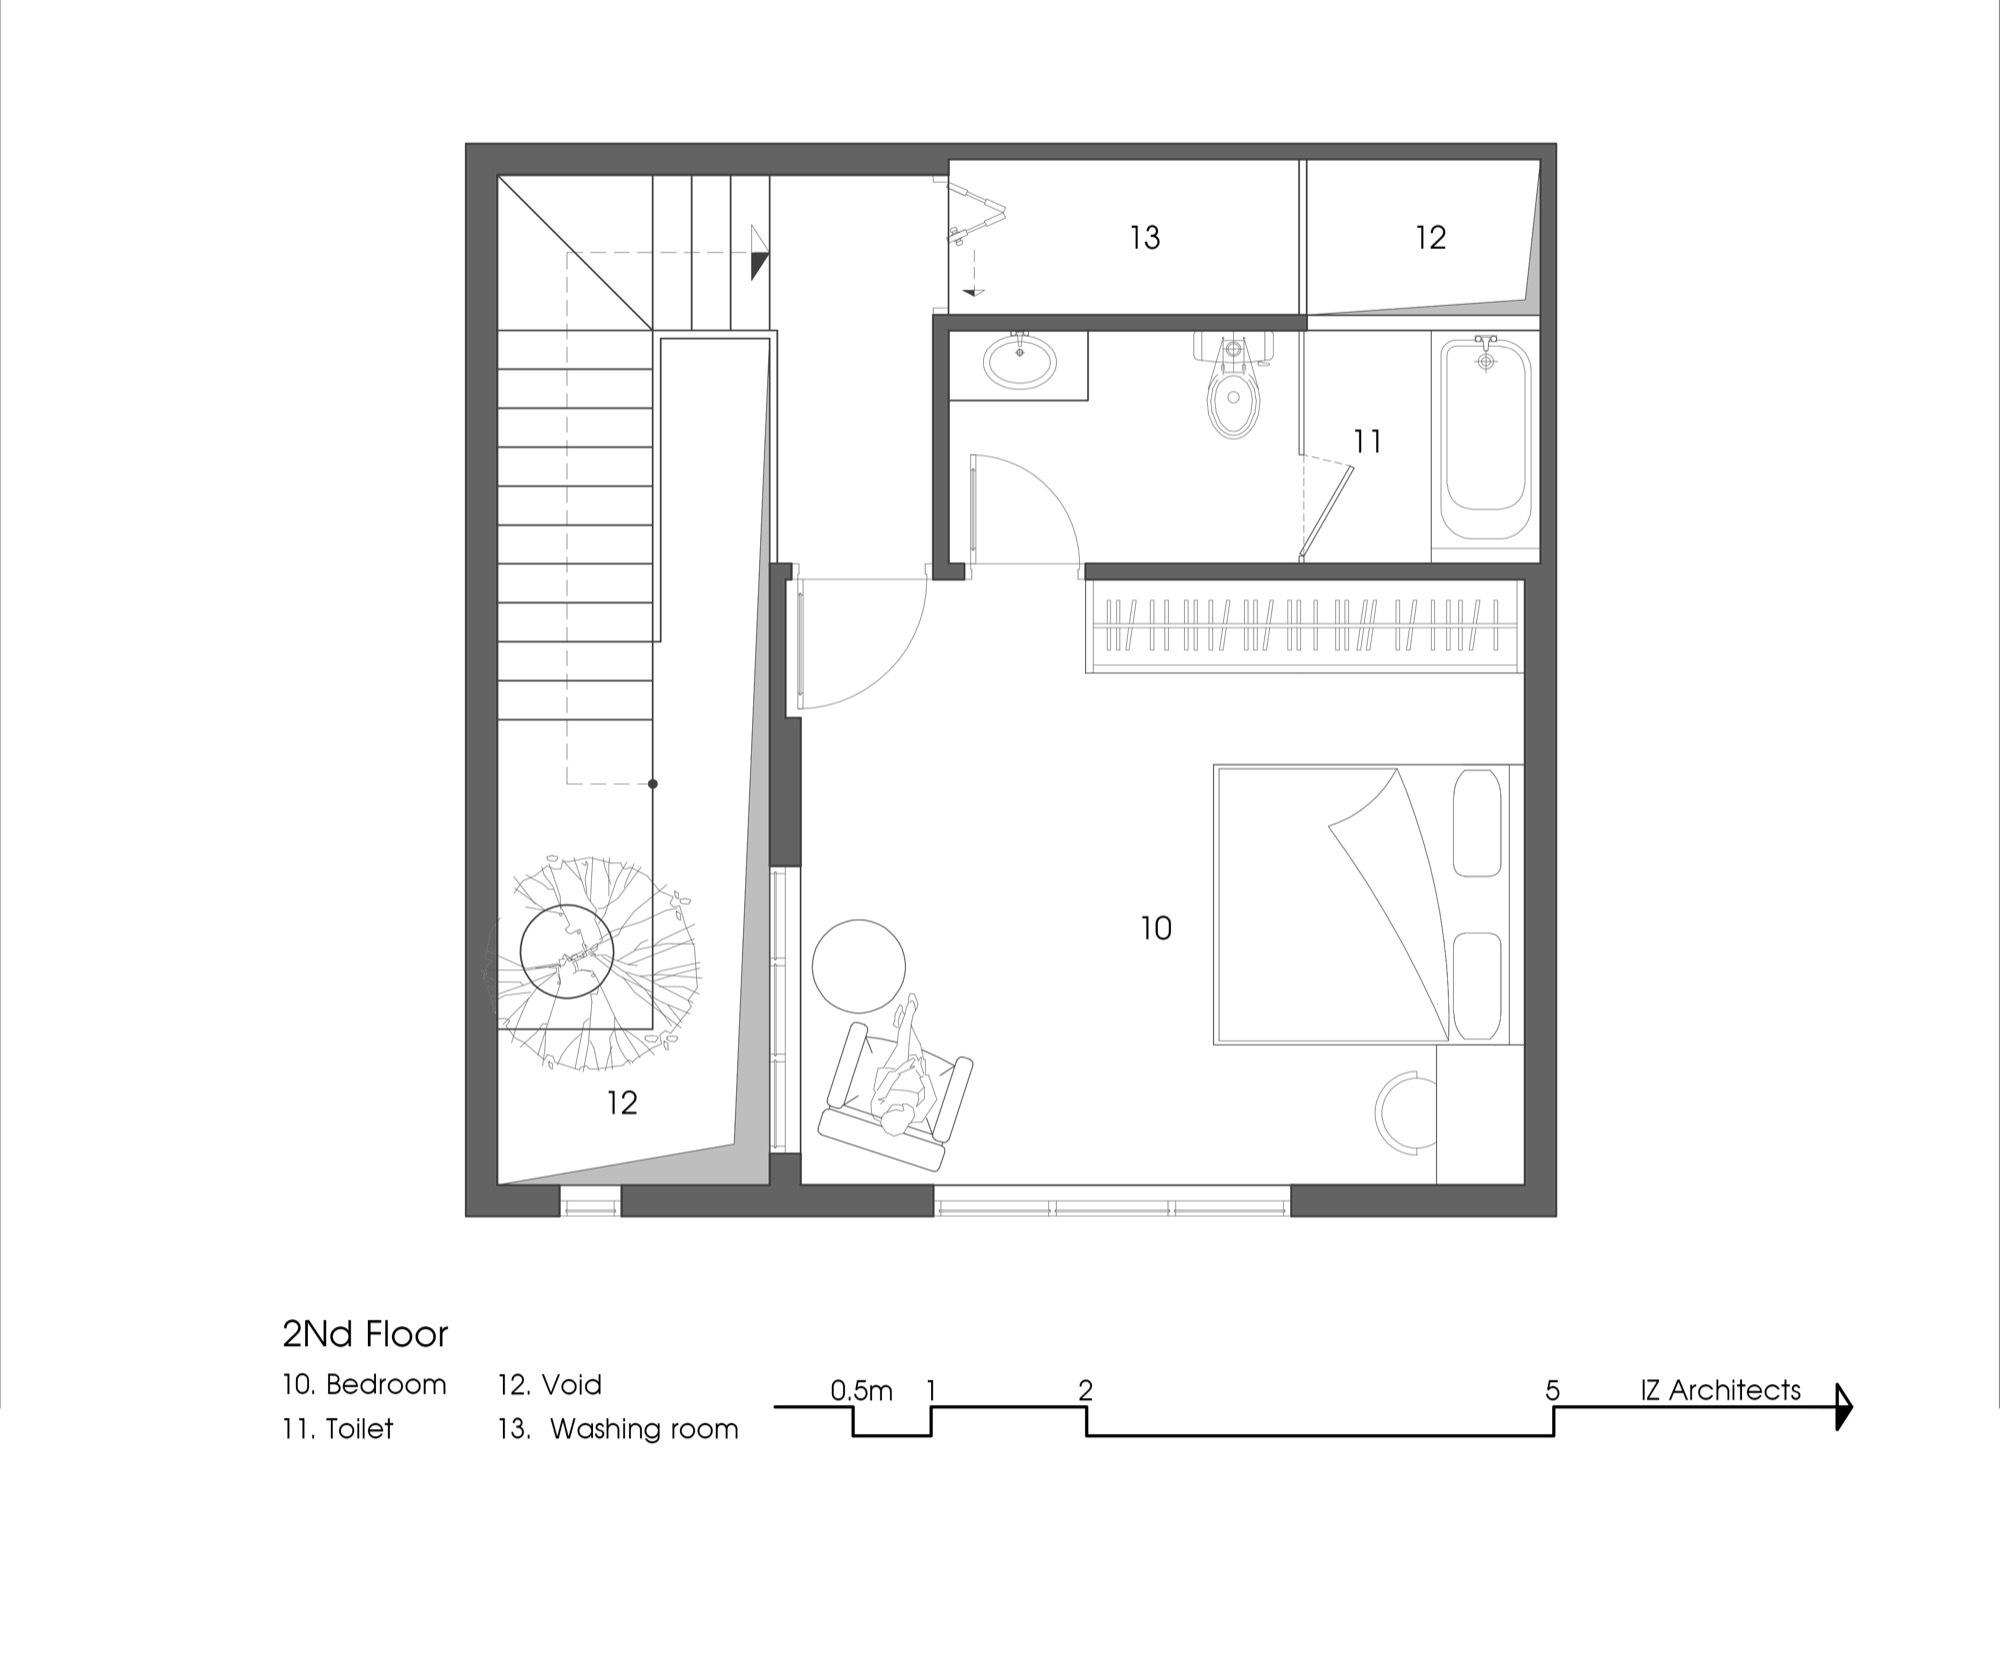 Gallery of 7x7 house iz architects 27 for Floor plan com